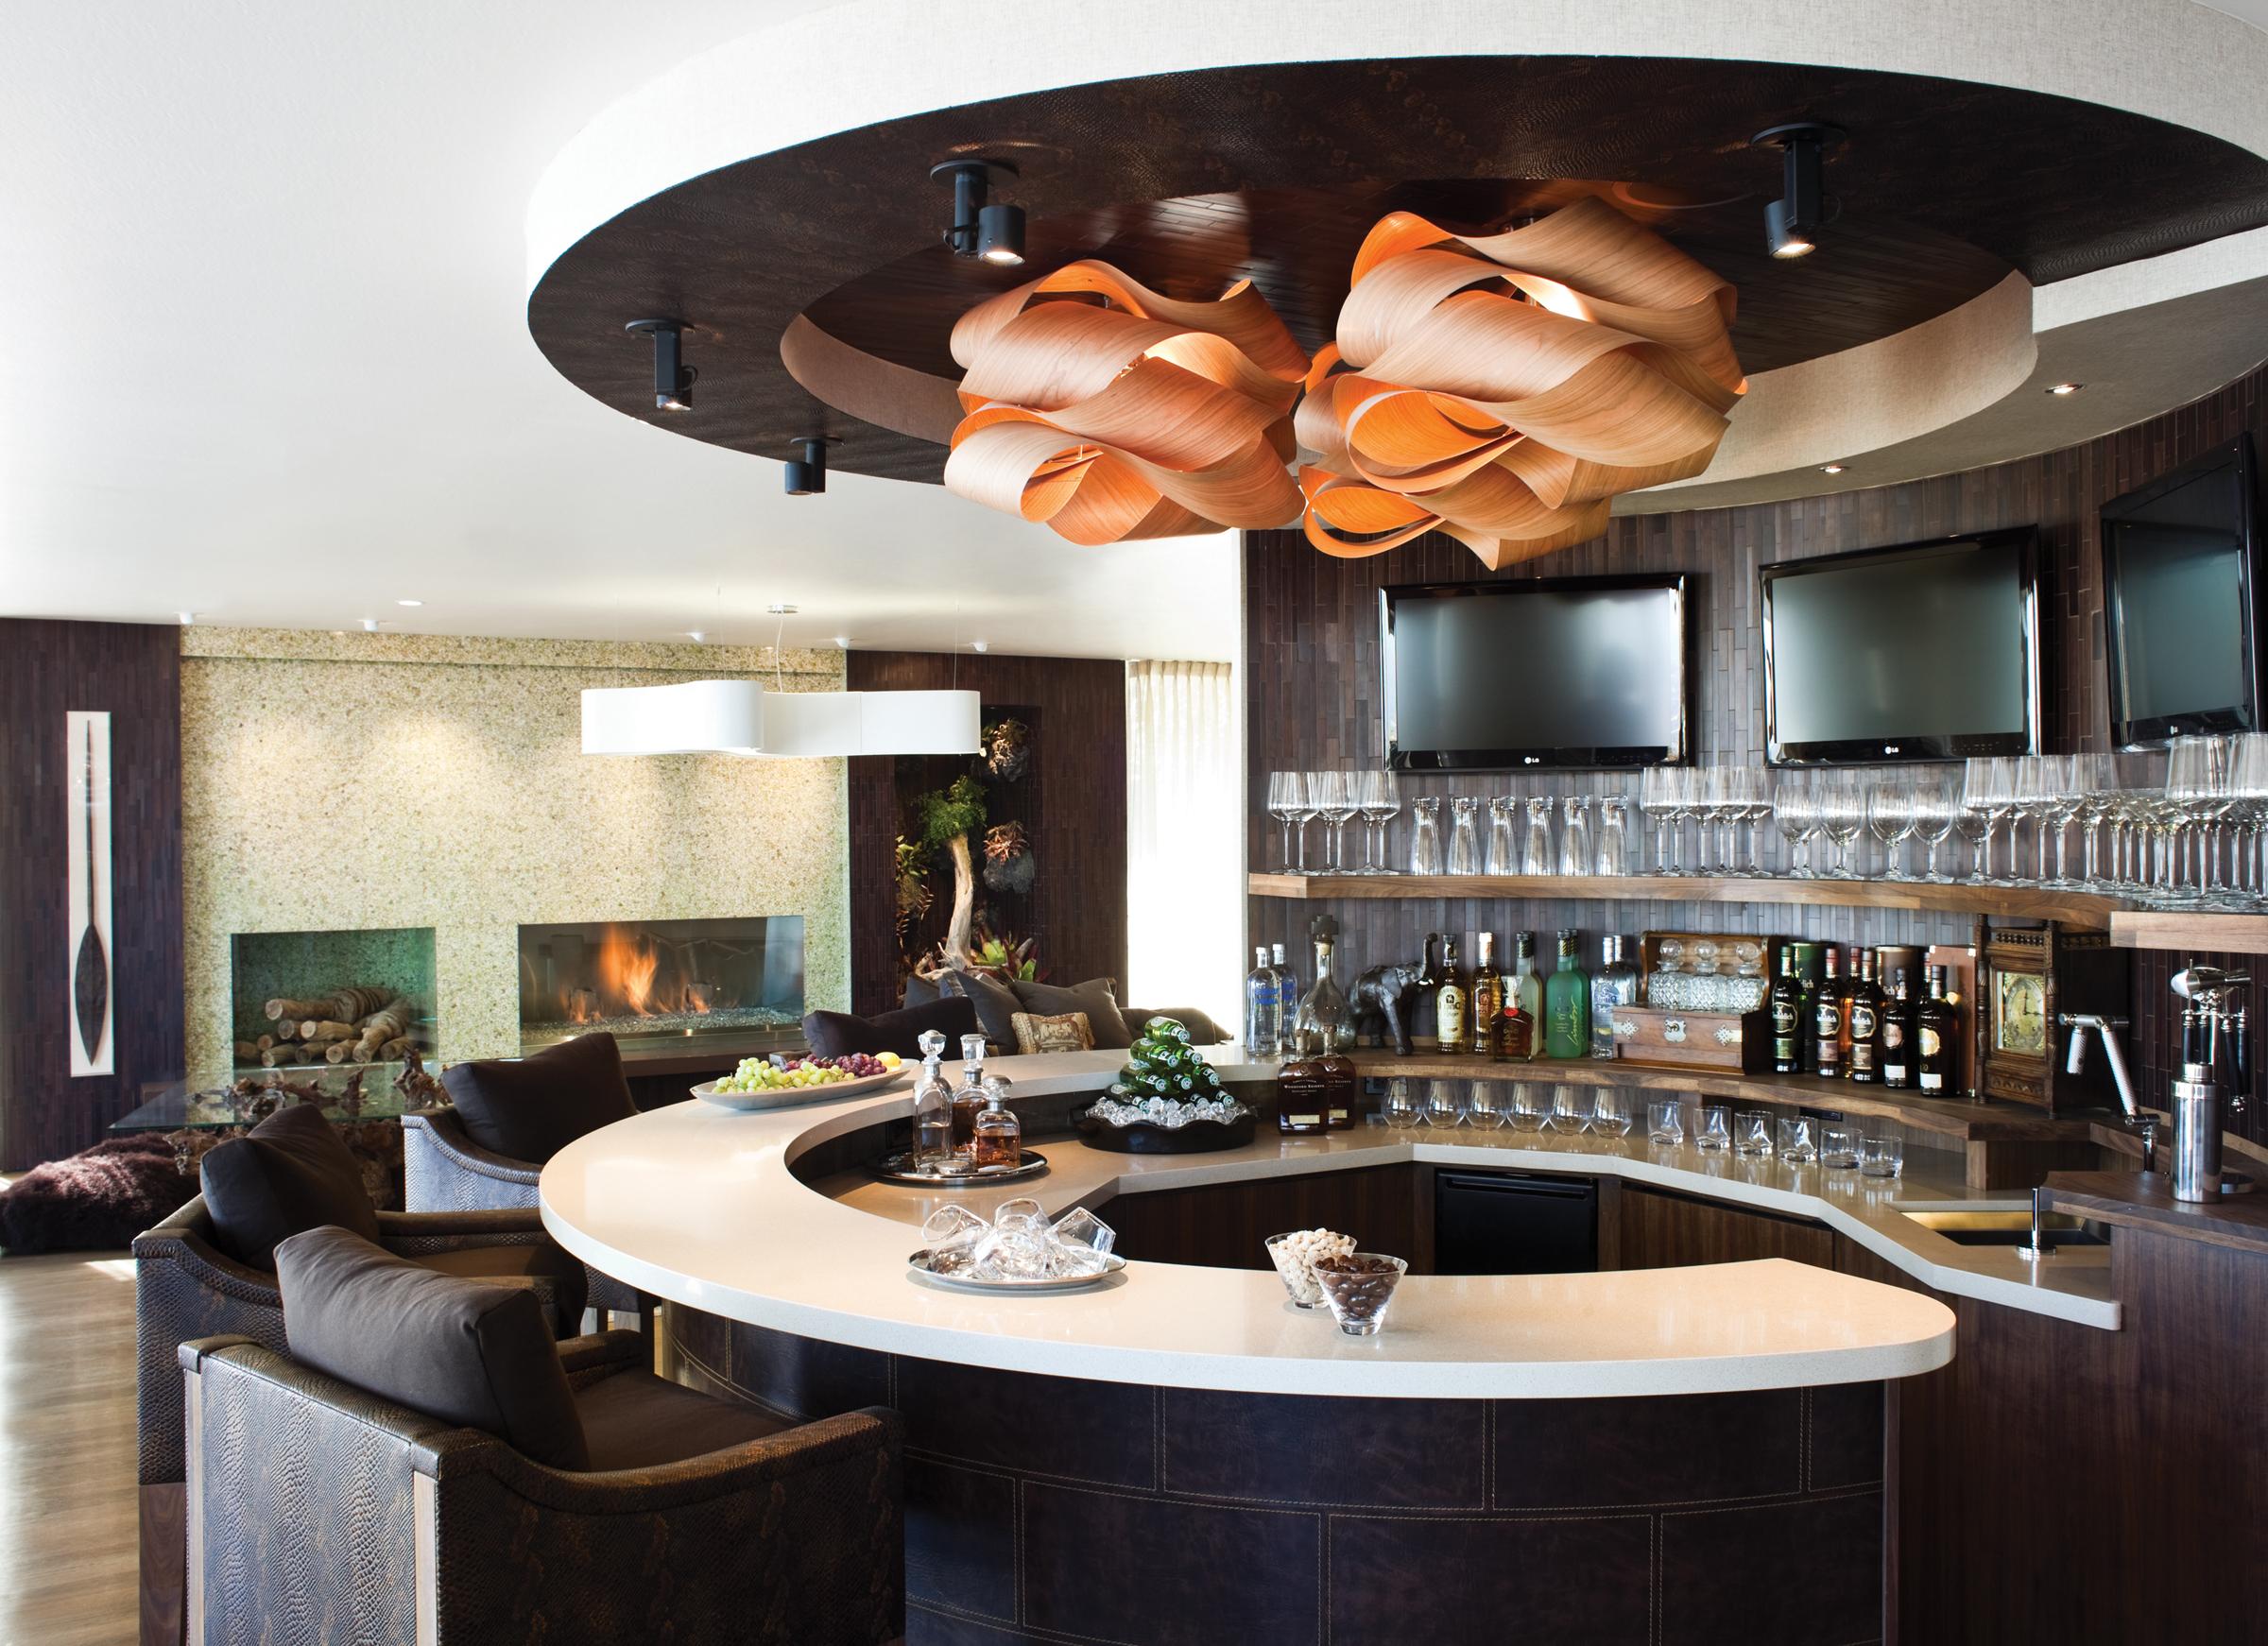 Bar and Ceiling - Mahogany Buffalo and Crocodile Ceiling.jpg